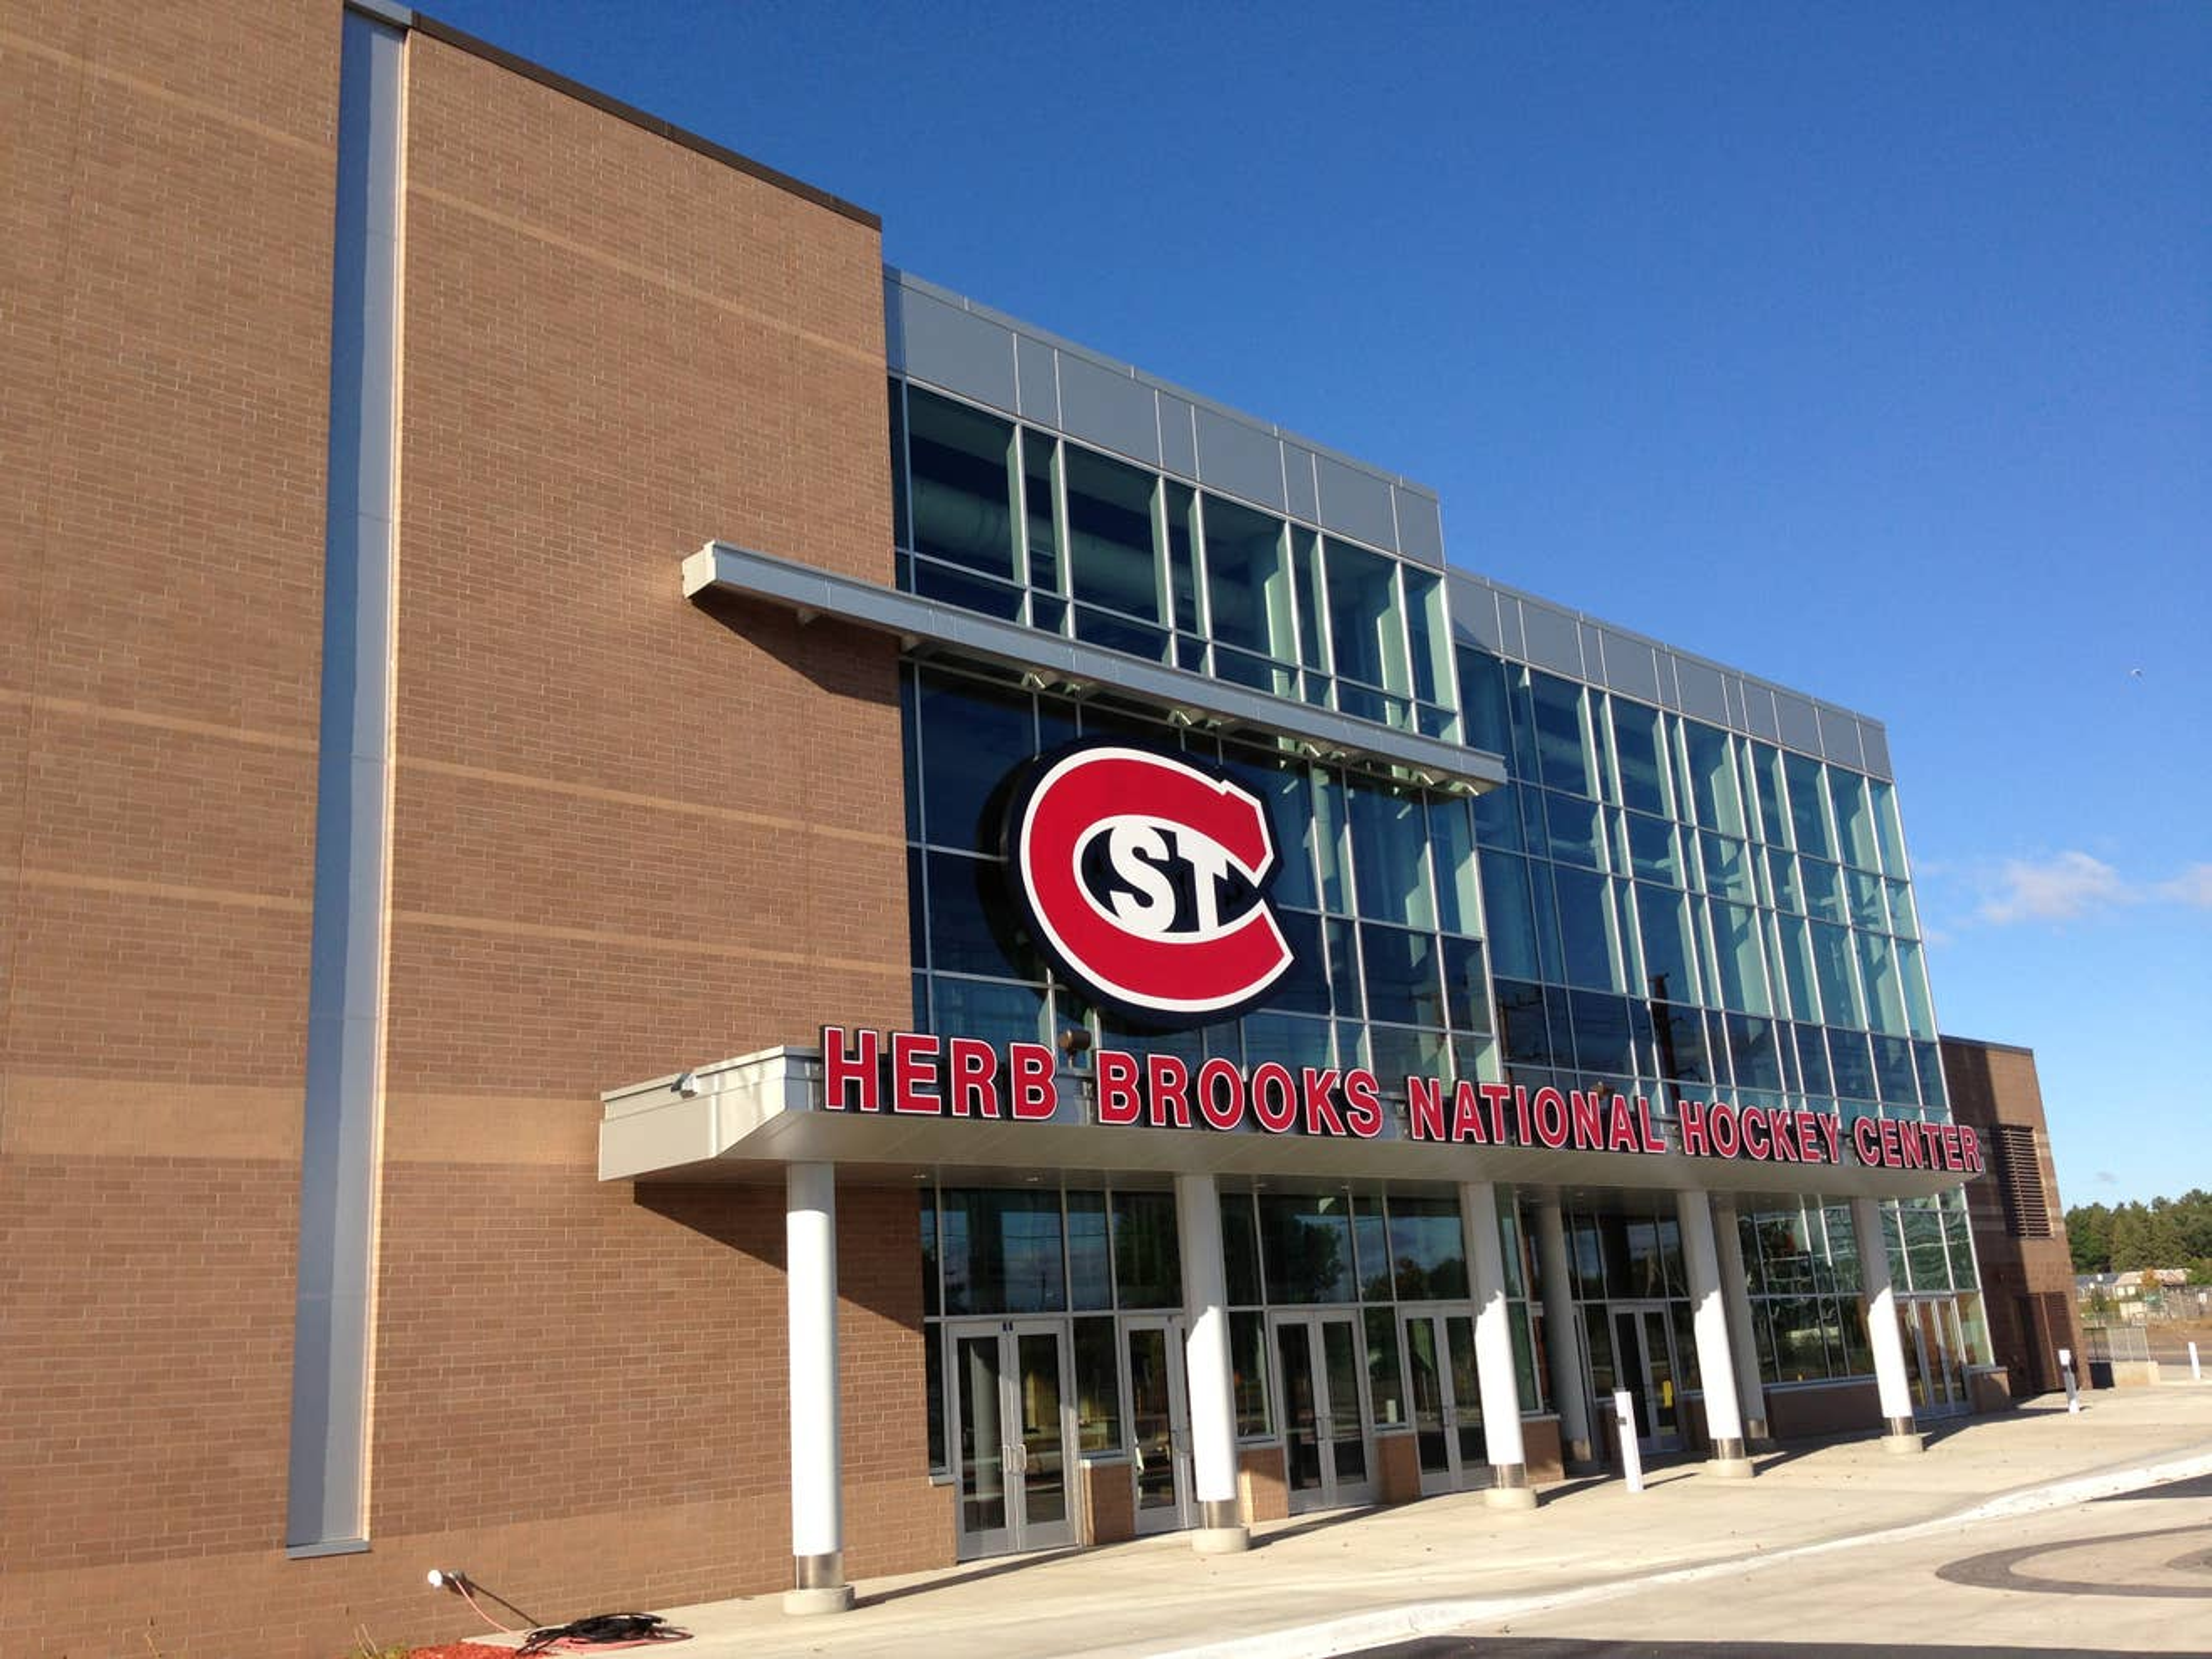 National Hockey Center